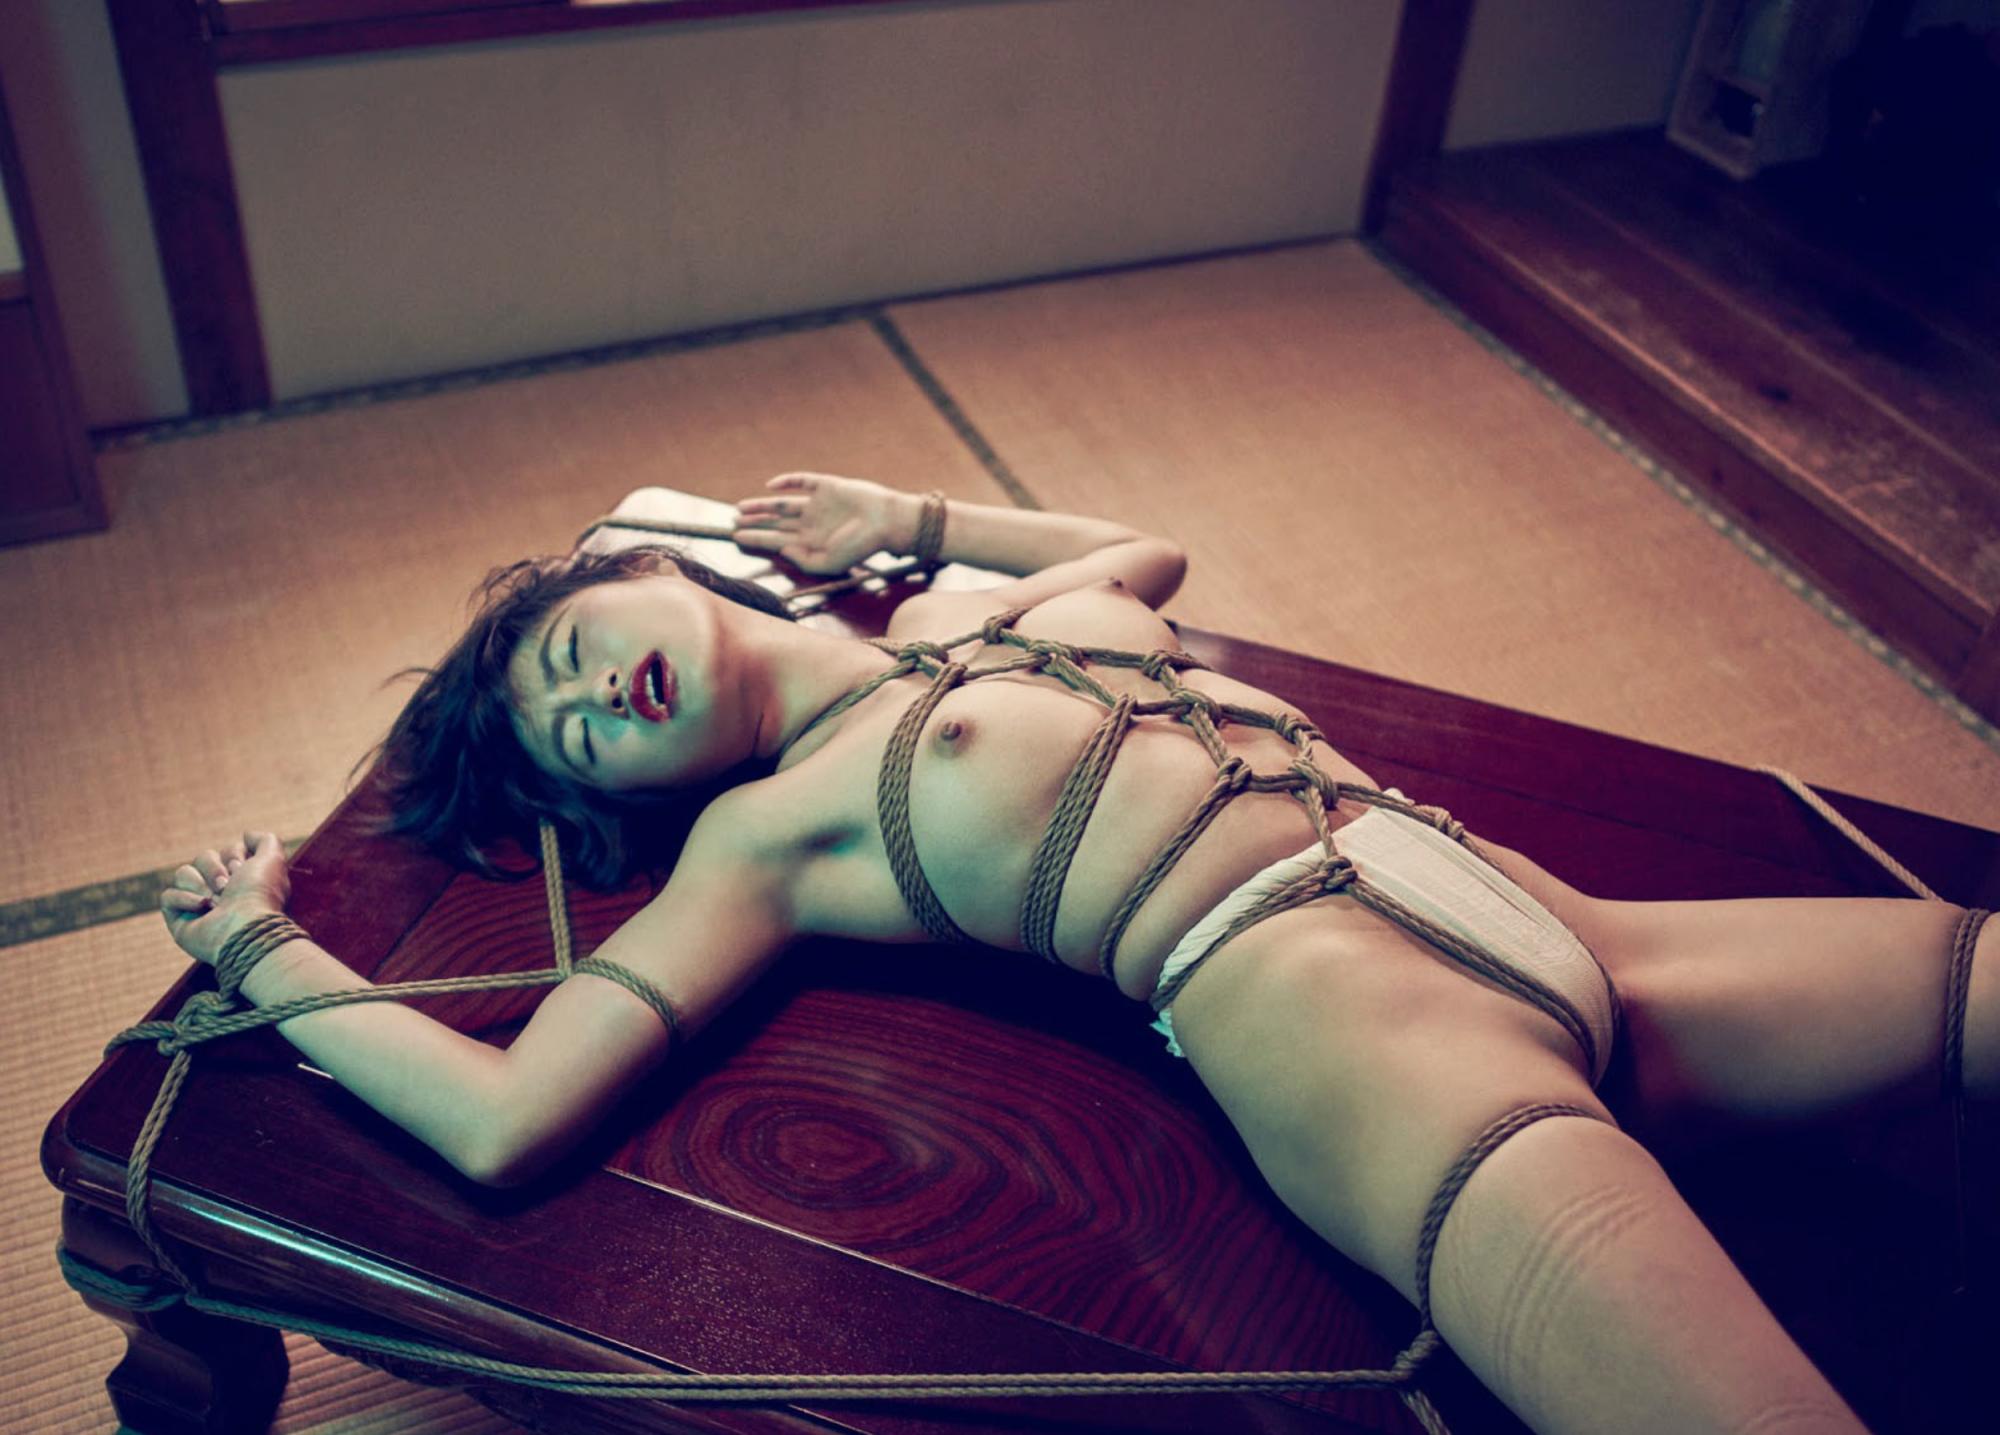 Pussy Sheri Chiu nude photos 2019